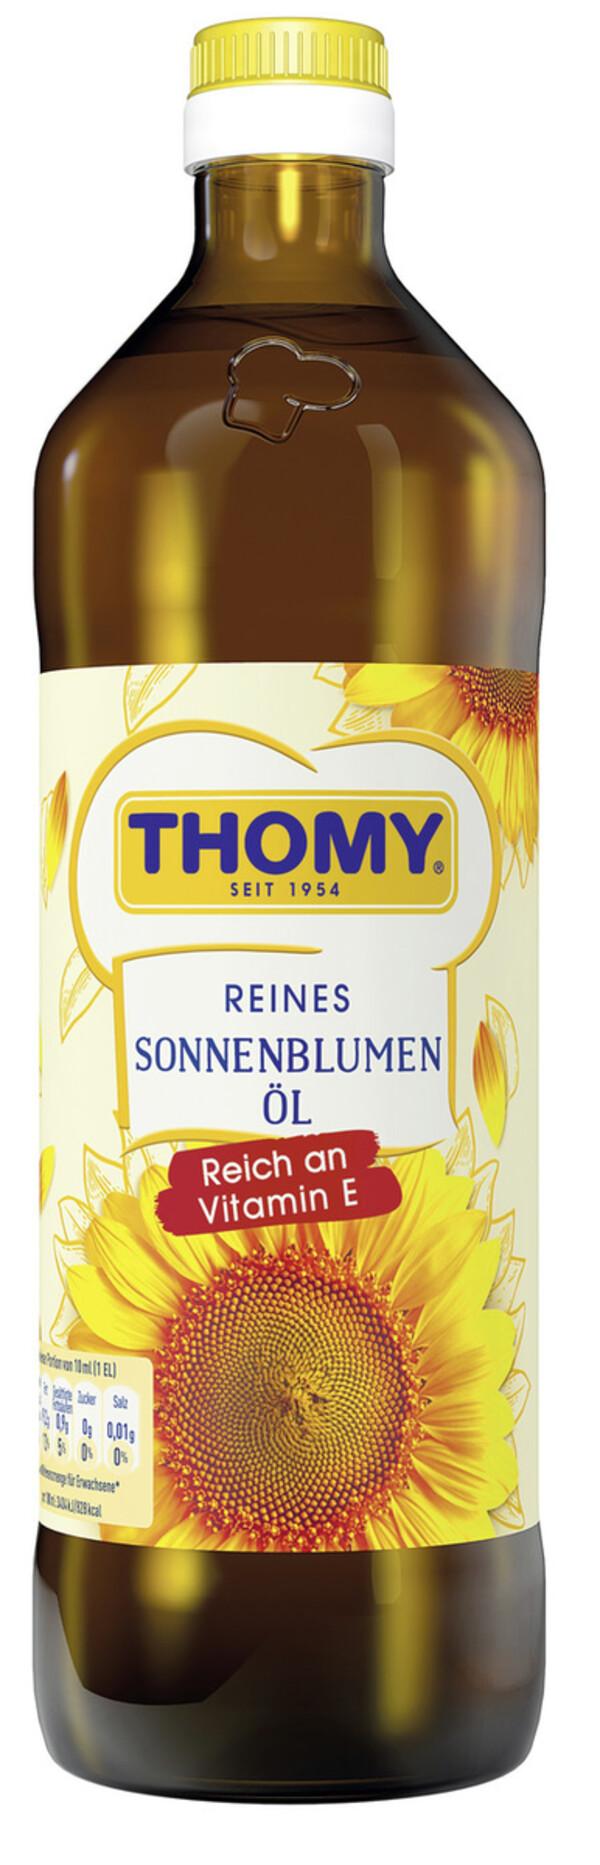 Thomy Sonnenblumenöl 750 ml